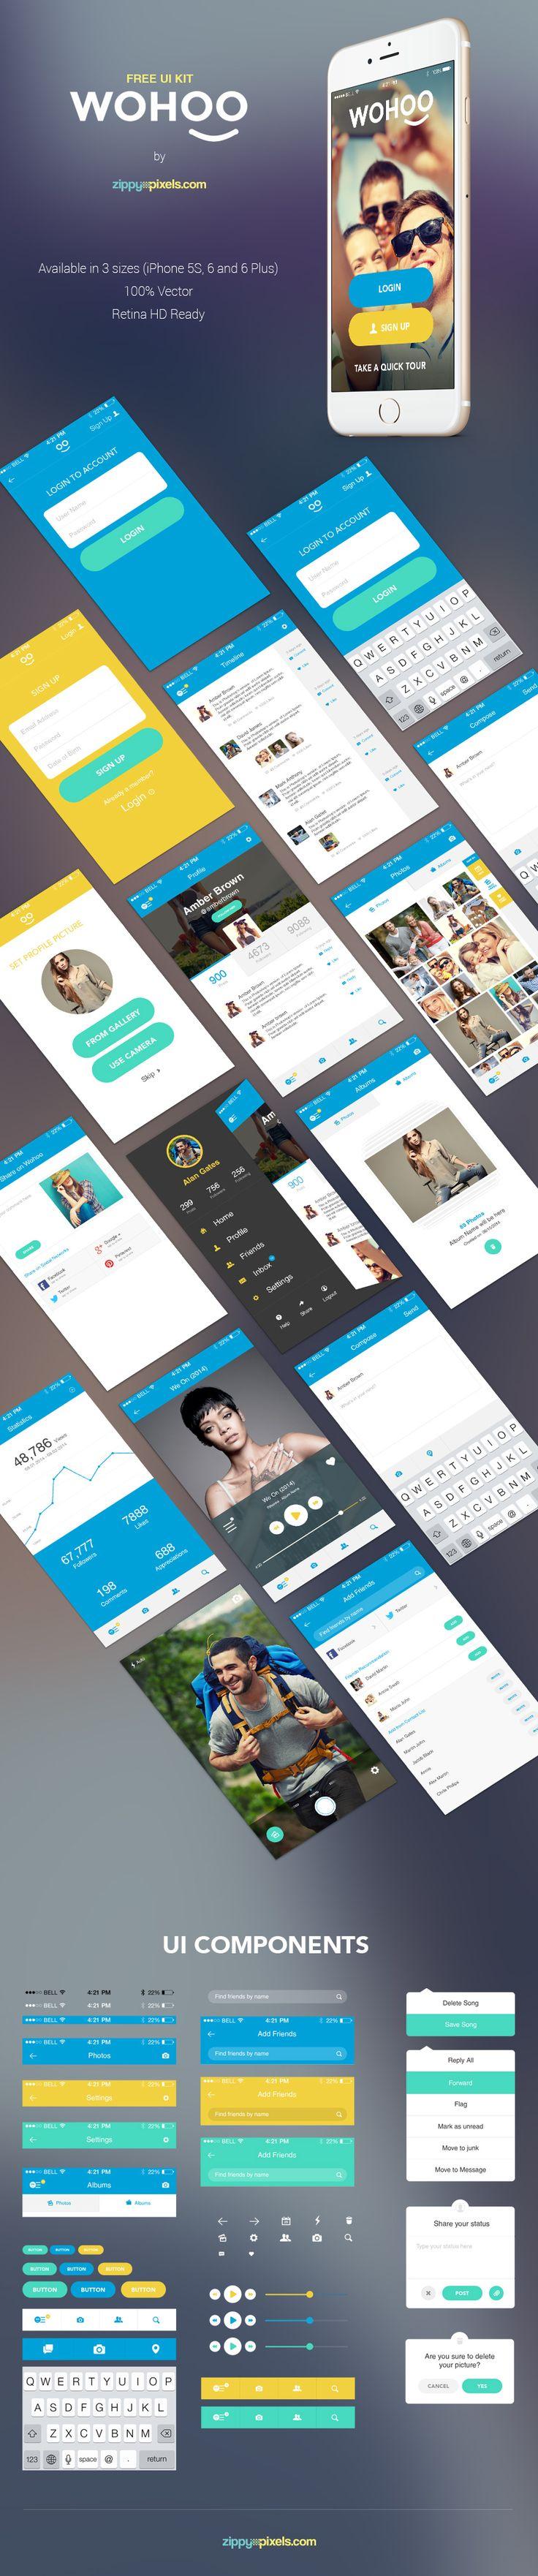 WOHOO – #free #Retina Ready #Mobile #UI KIT